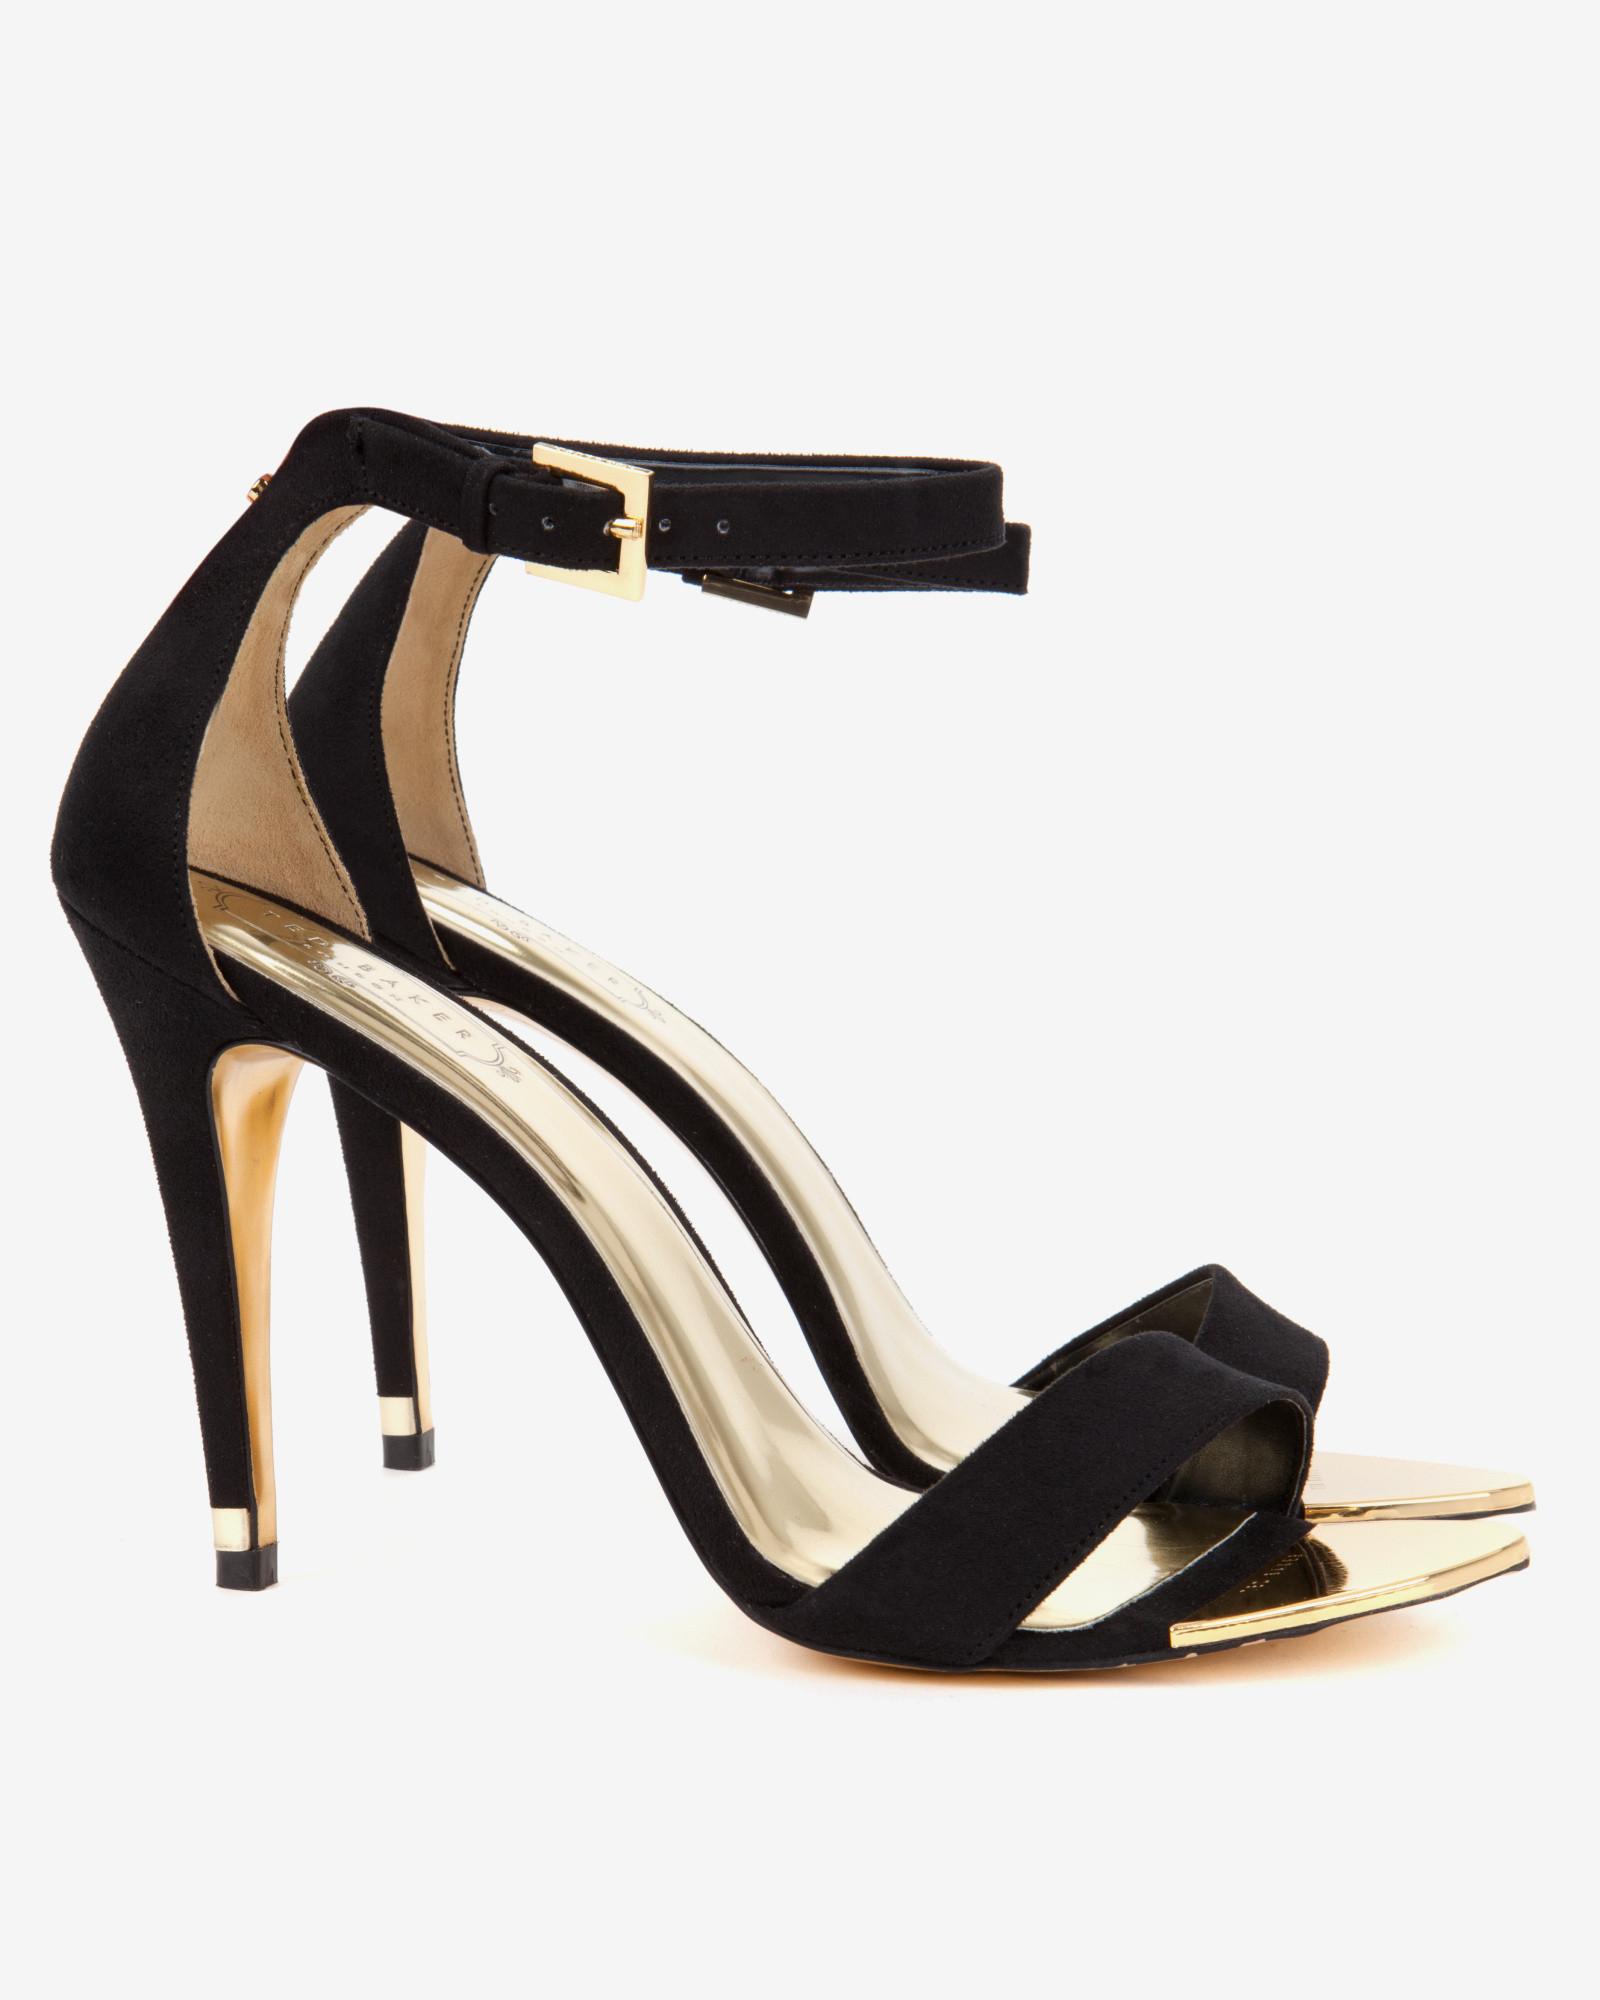 7801da0574865 Ted Baker Ankle Strap Sandals in Black - Lyst